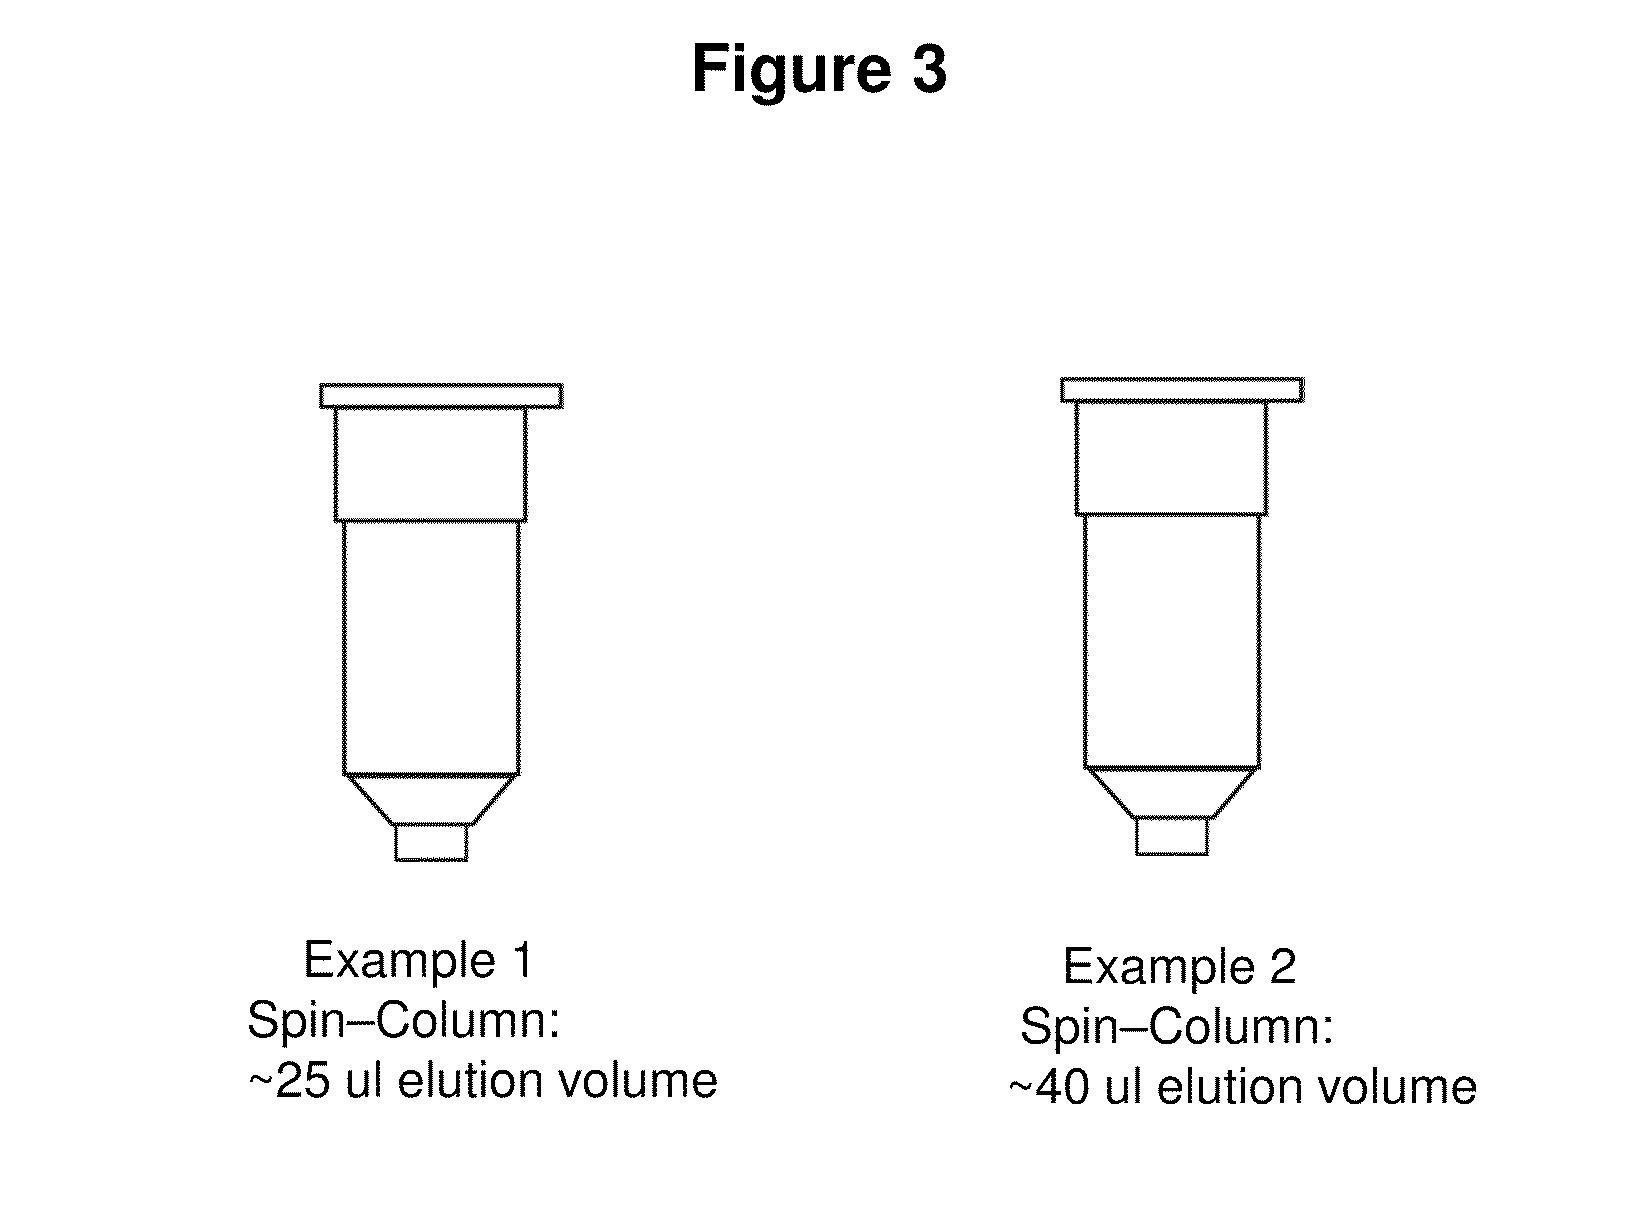 plasmid isolation by alkaline lysis method pdf